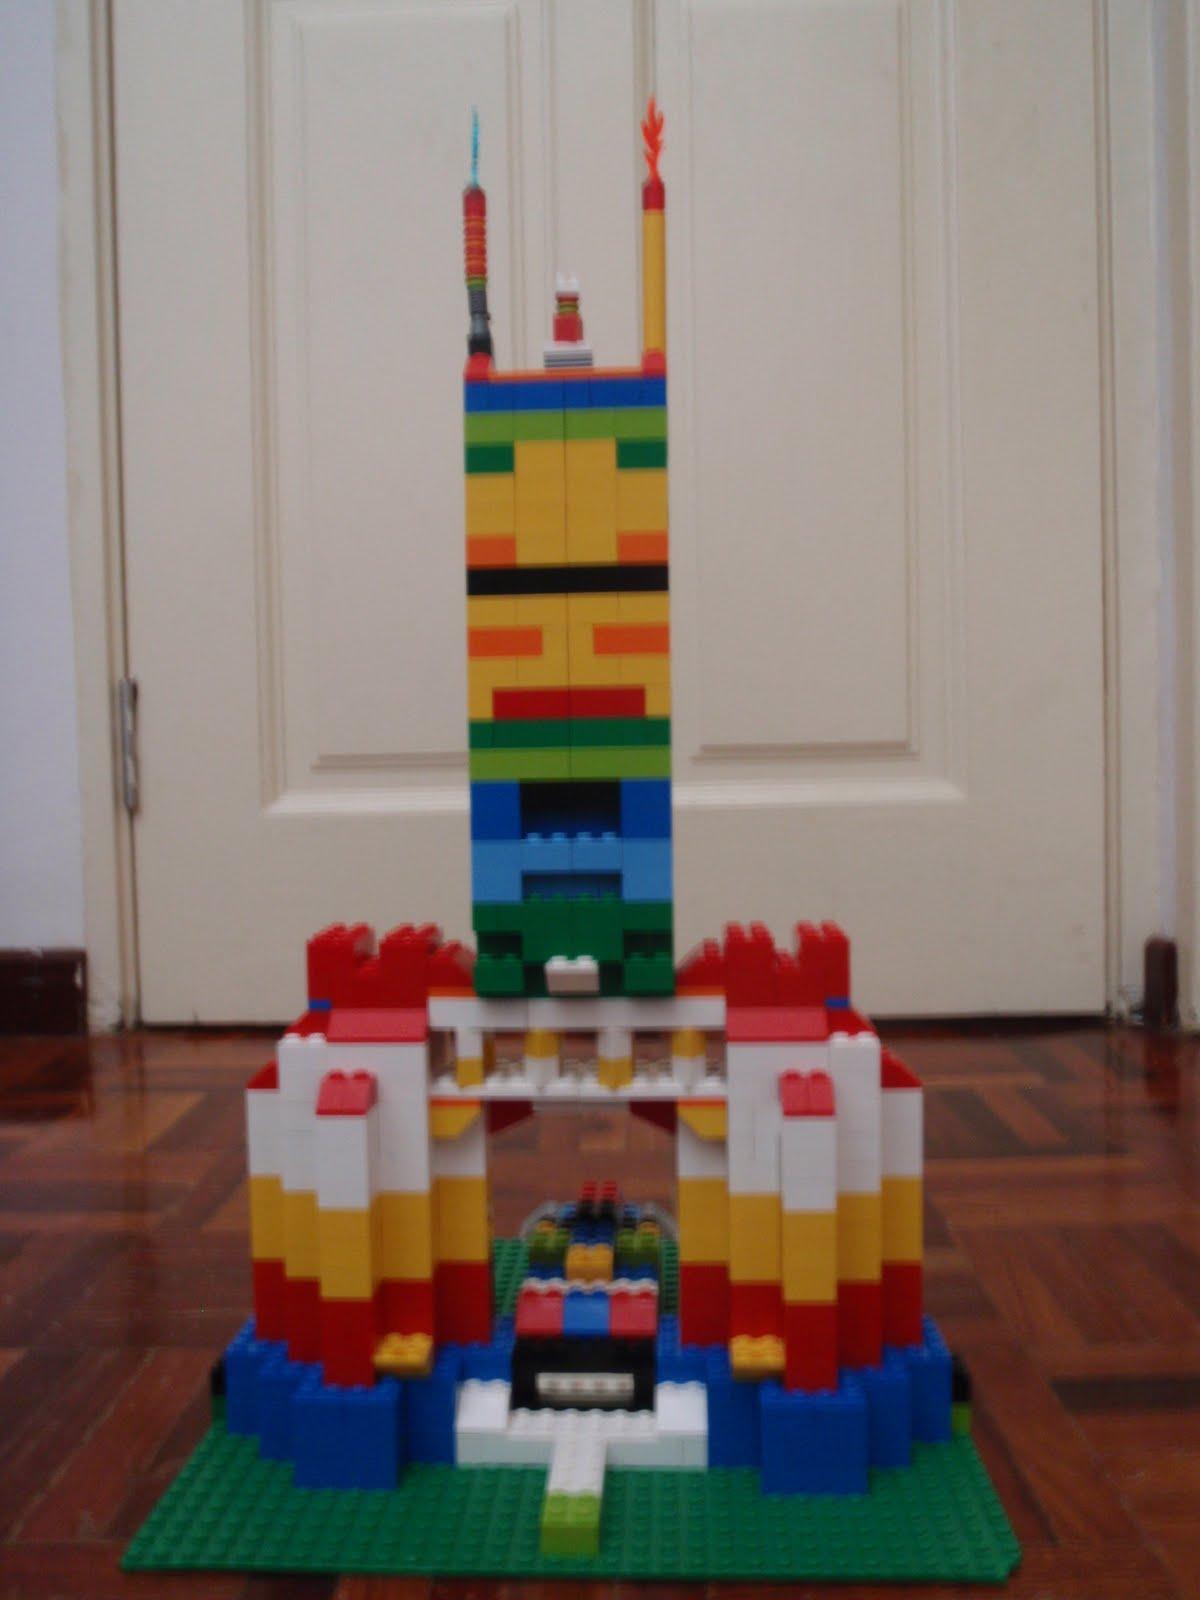 Lego-Tower2.JPG